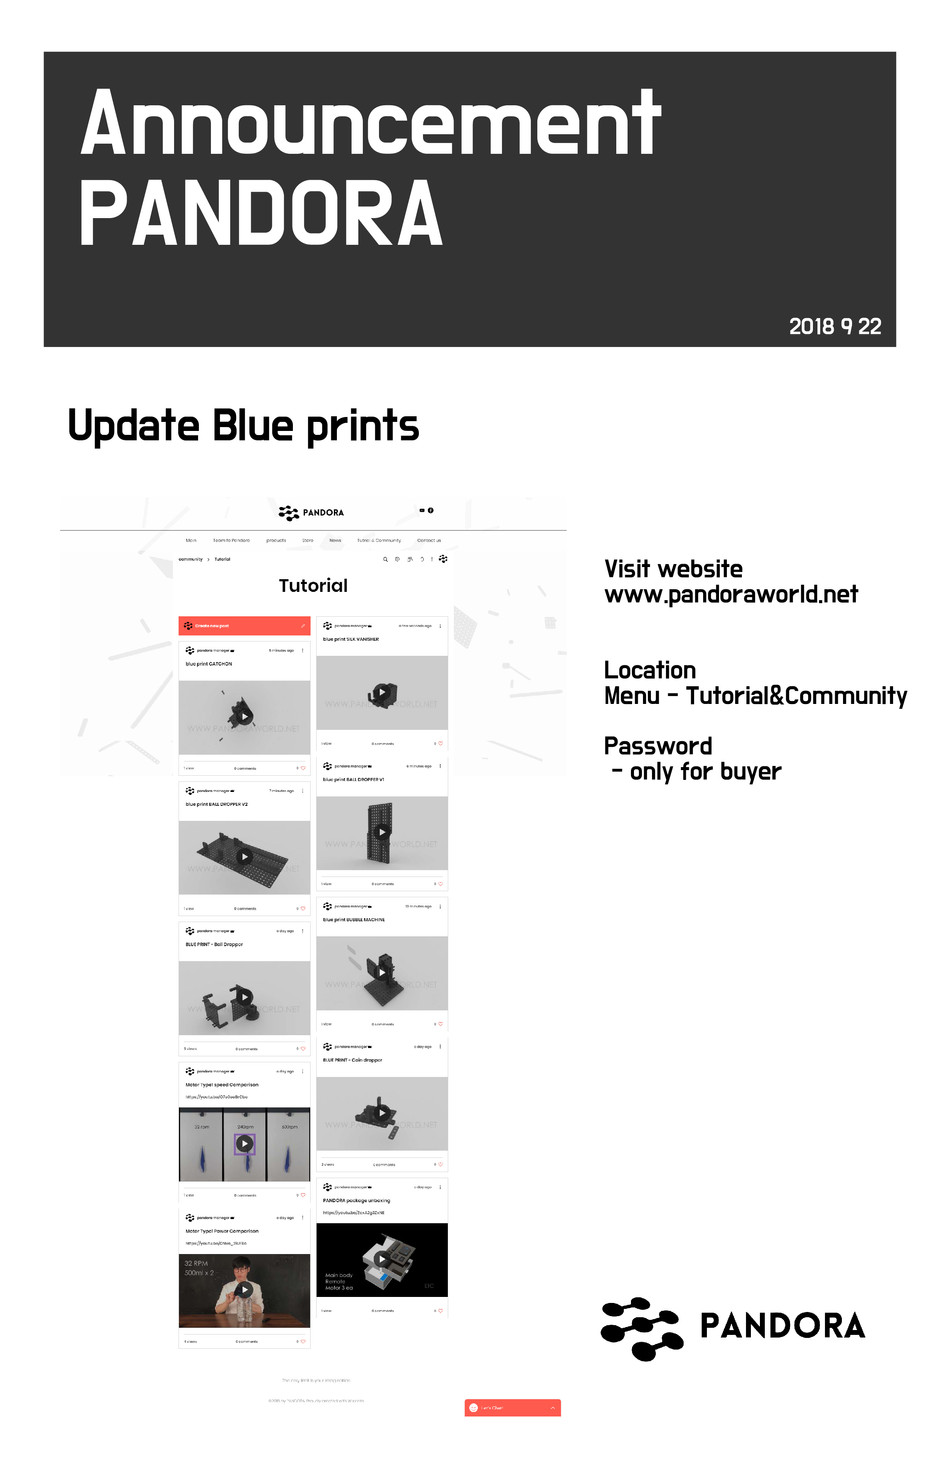 UPDATE BLUE PRINTS